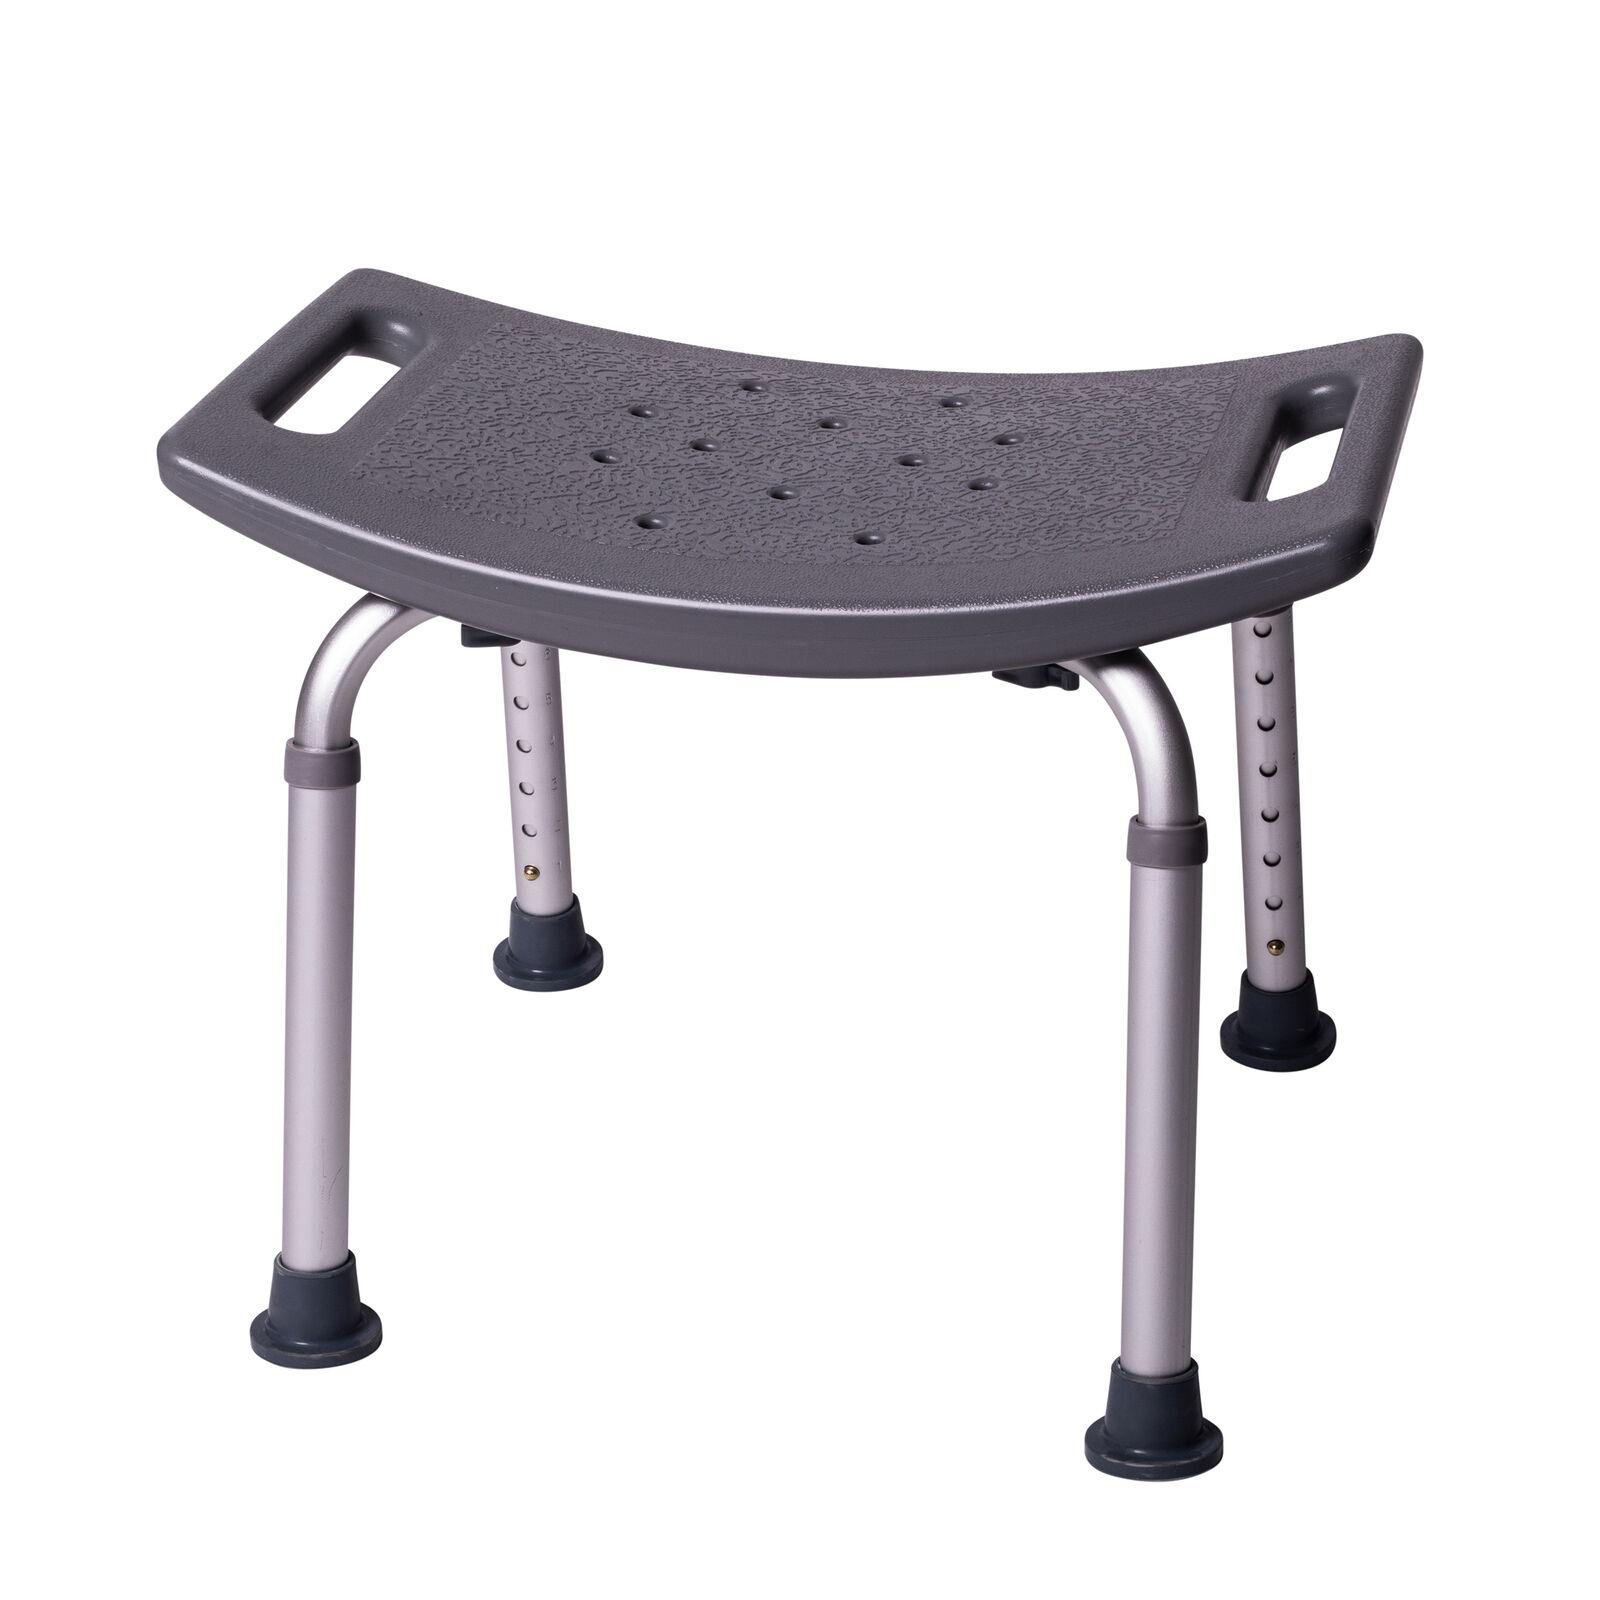 ONVAYA Badhocker   grau   150 kg   Duschhocker höhenverstellbar   Badestuhl